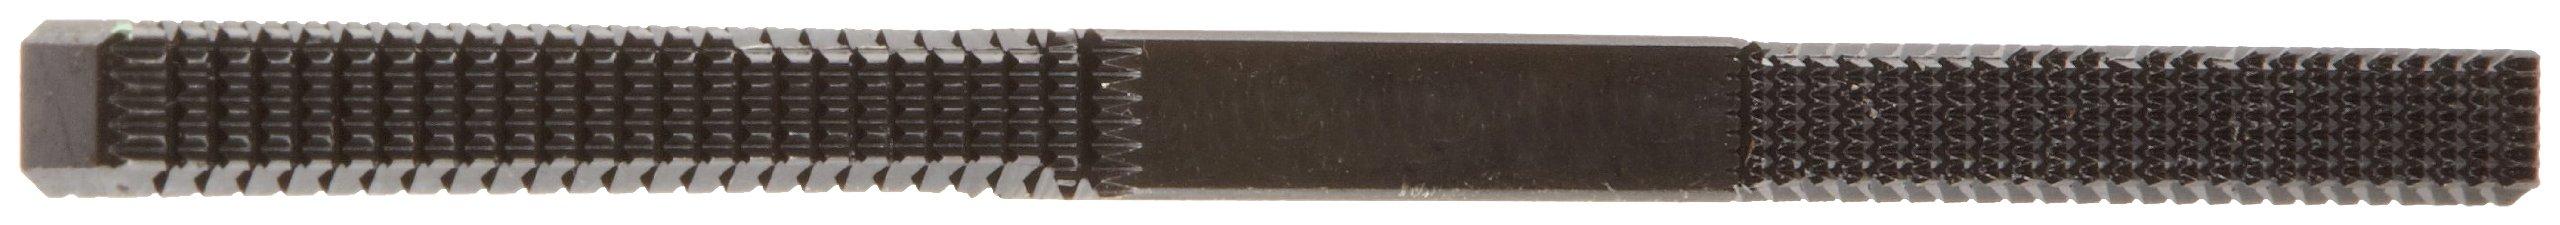 Nicholson Hand File, Thread Restoring, Thread Teeth, Square, Metric Bolt, 6'' Length